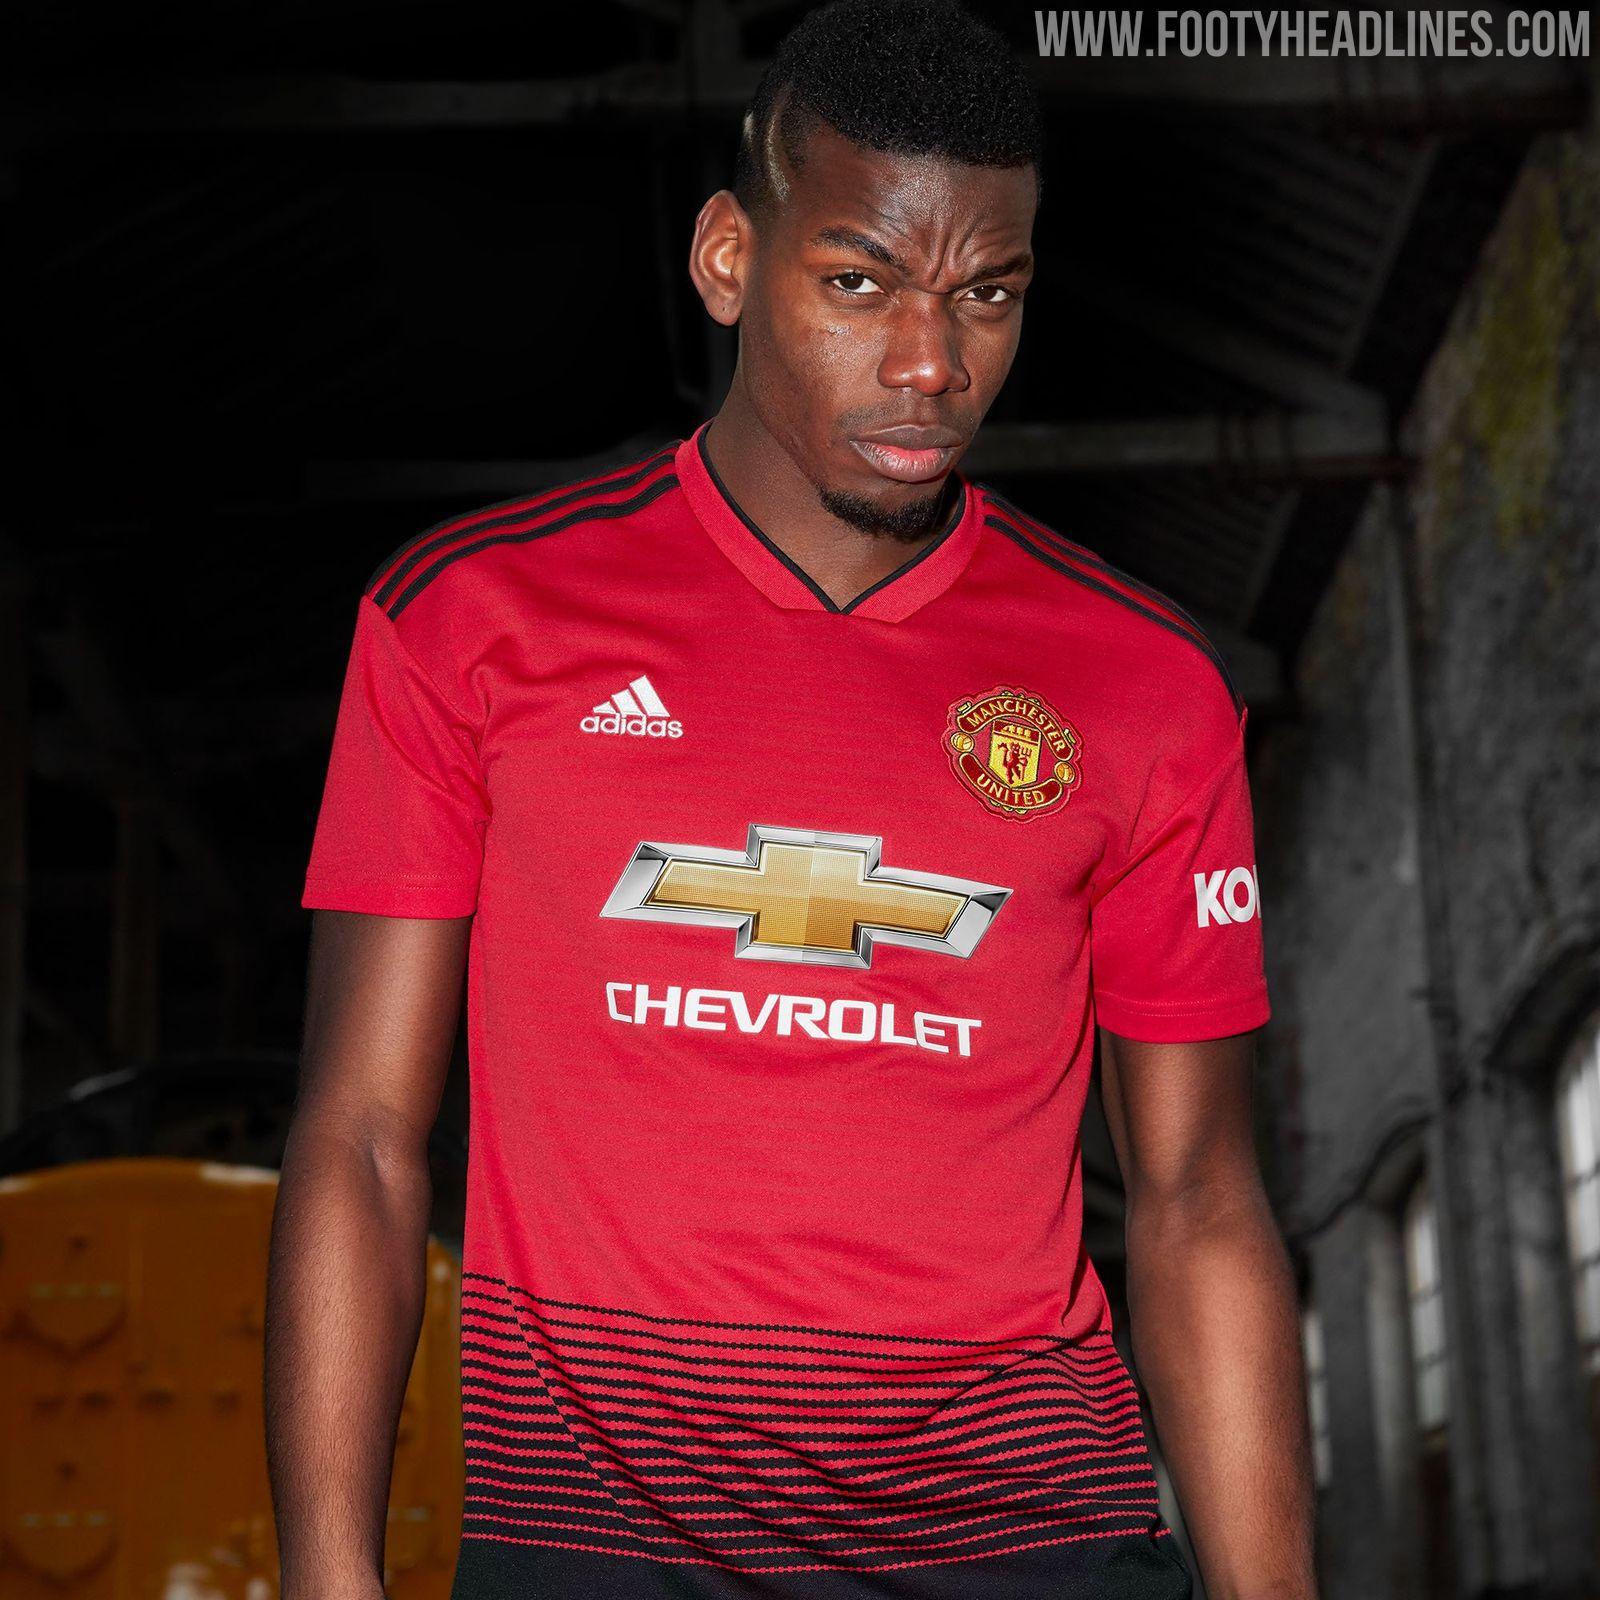 Footyheadlines Manchester United 2018 19 Season Home Kit: Manchester United 18-19 Home Kit Revealed